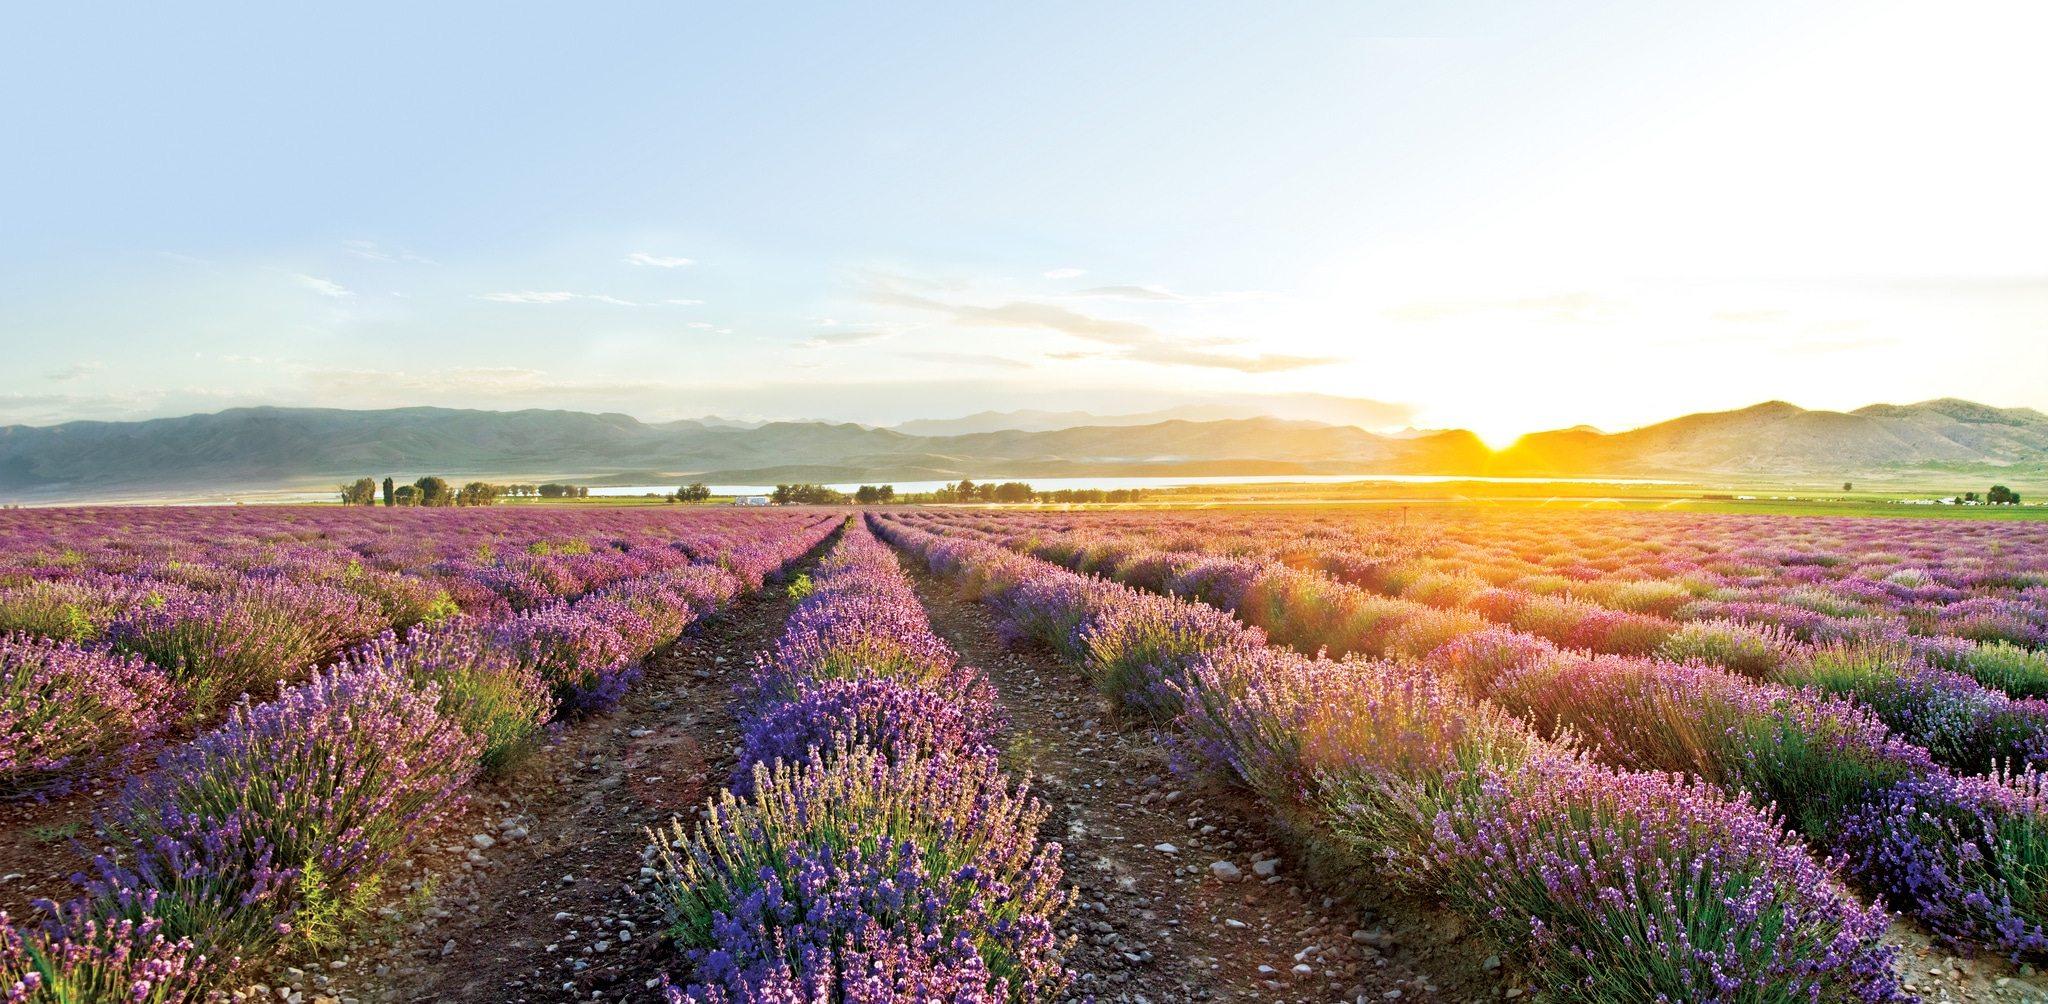 Young Living Lavender Farm Mona Utah Tom Nikkola